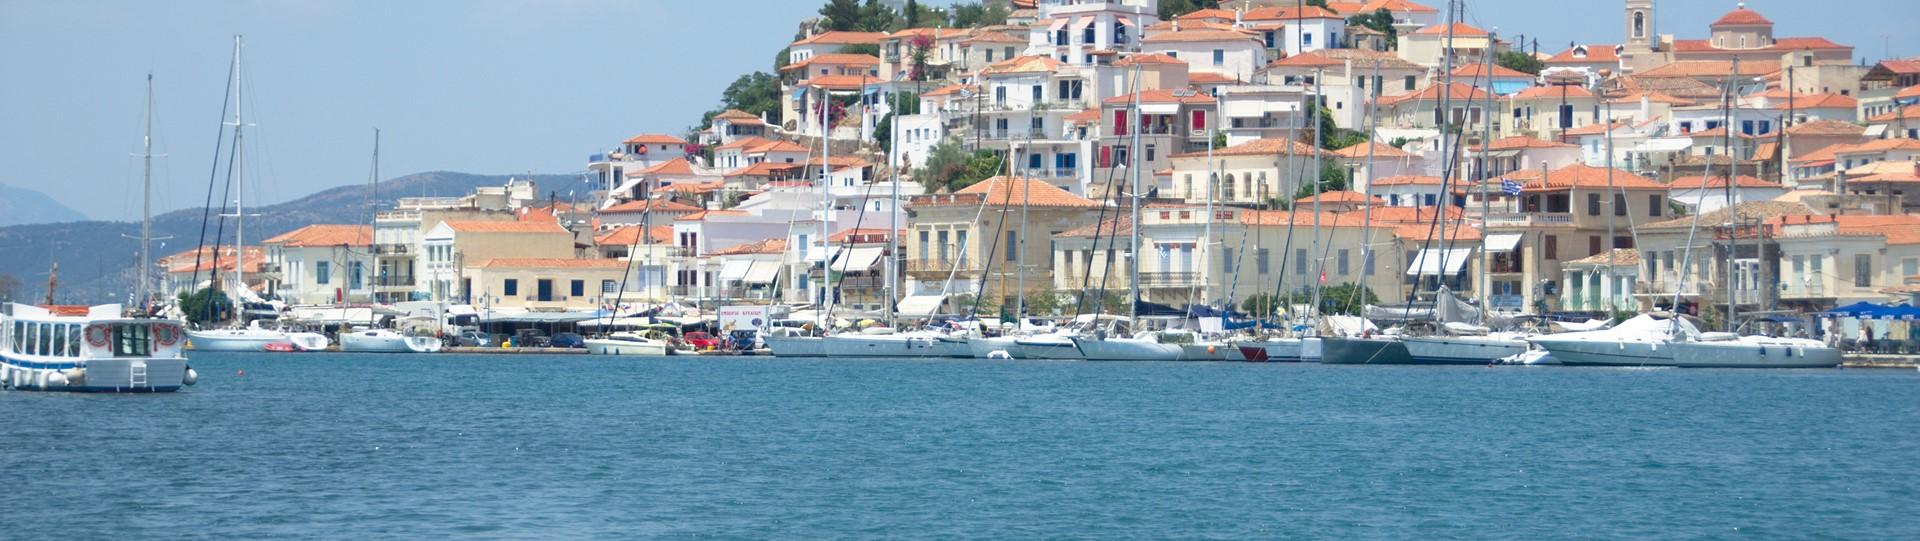 Het idyllische Griekse eiland Poros